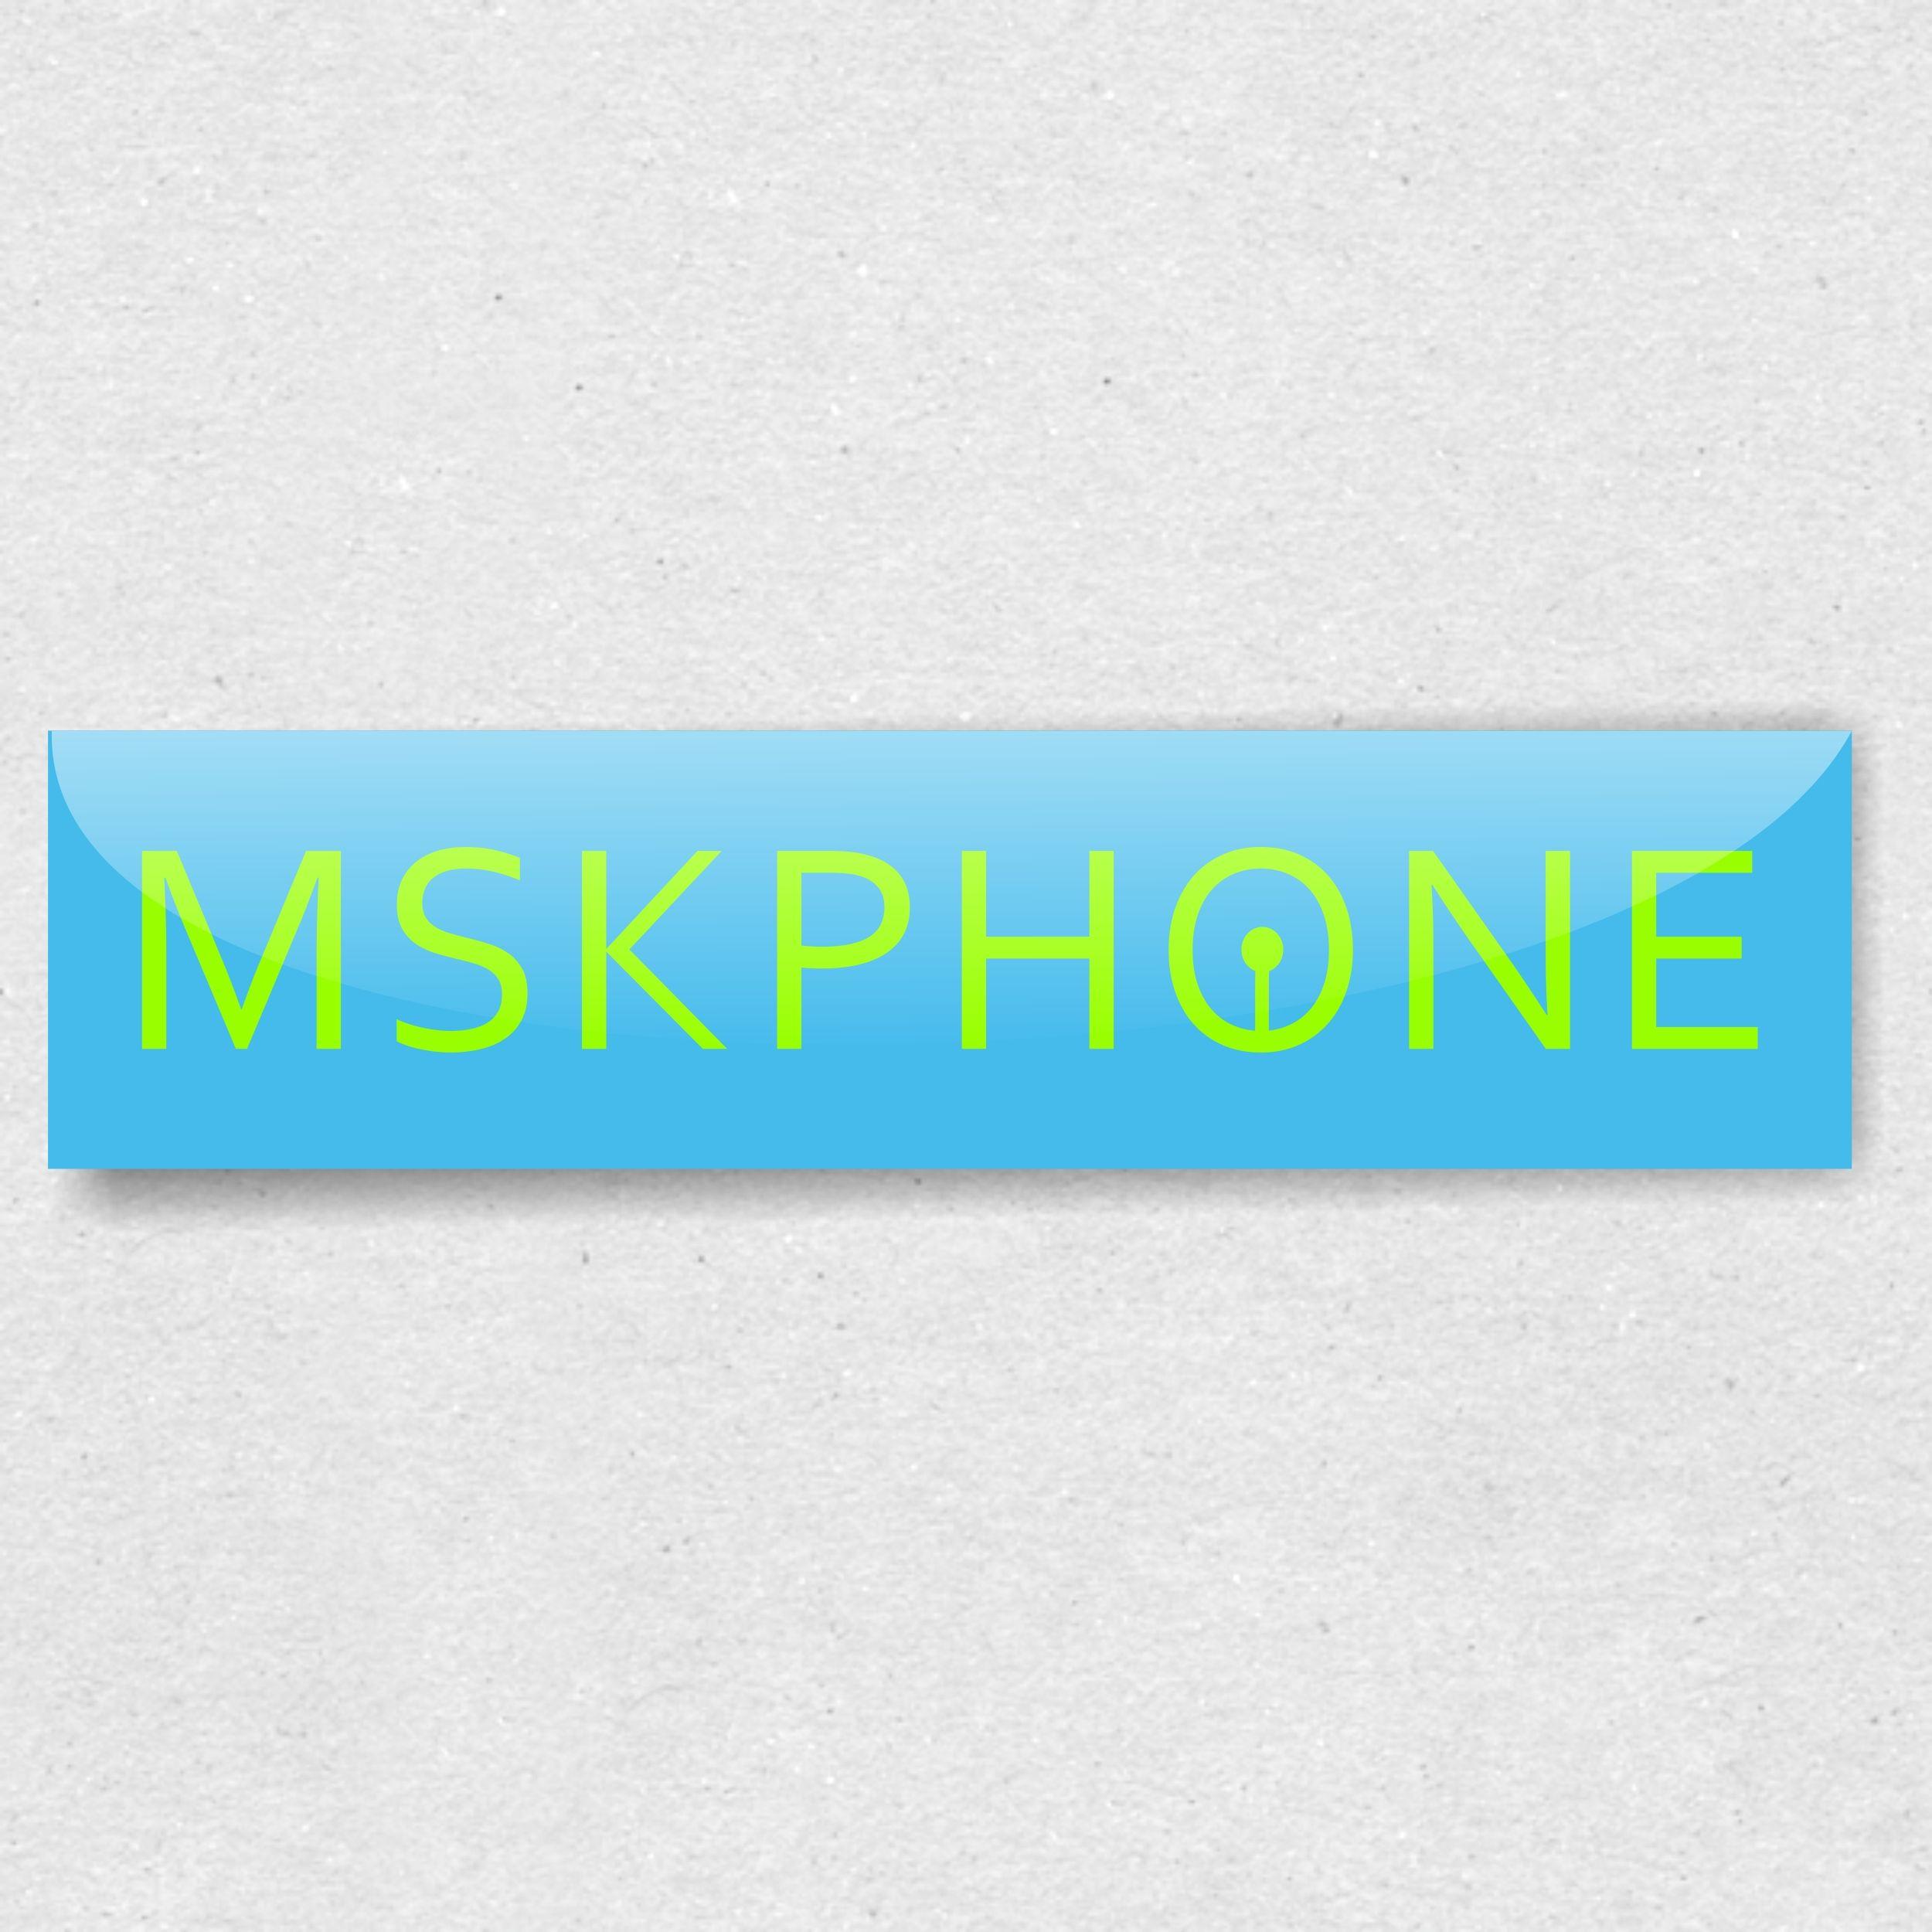 Логотип для MSKPHONE - дизайнер Volkonskiy